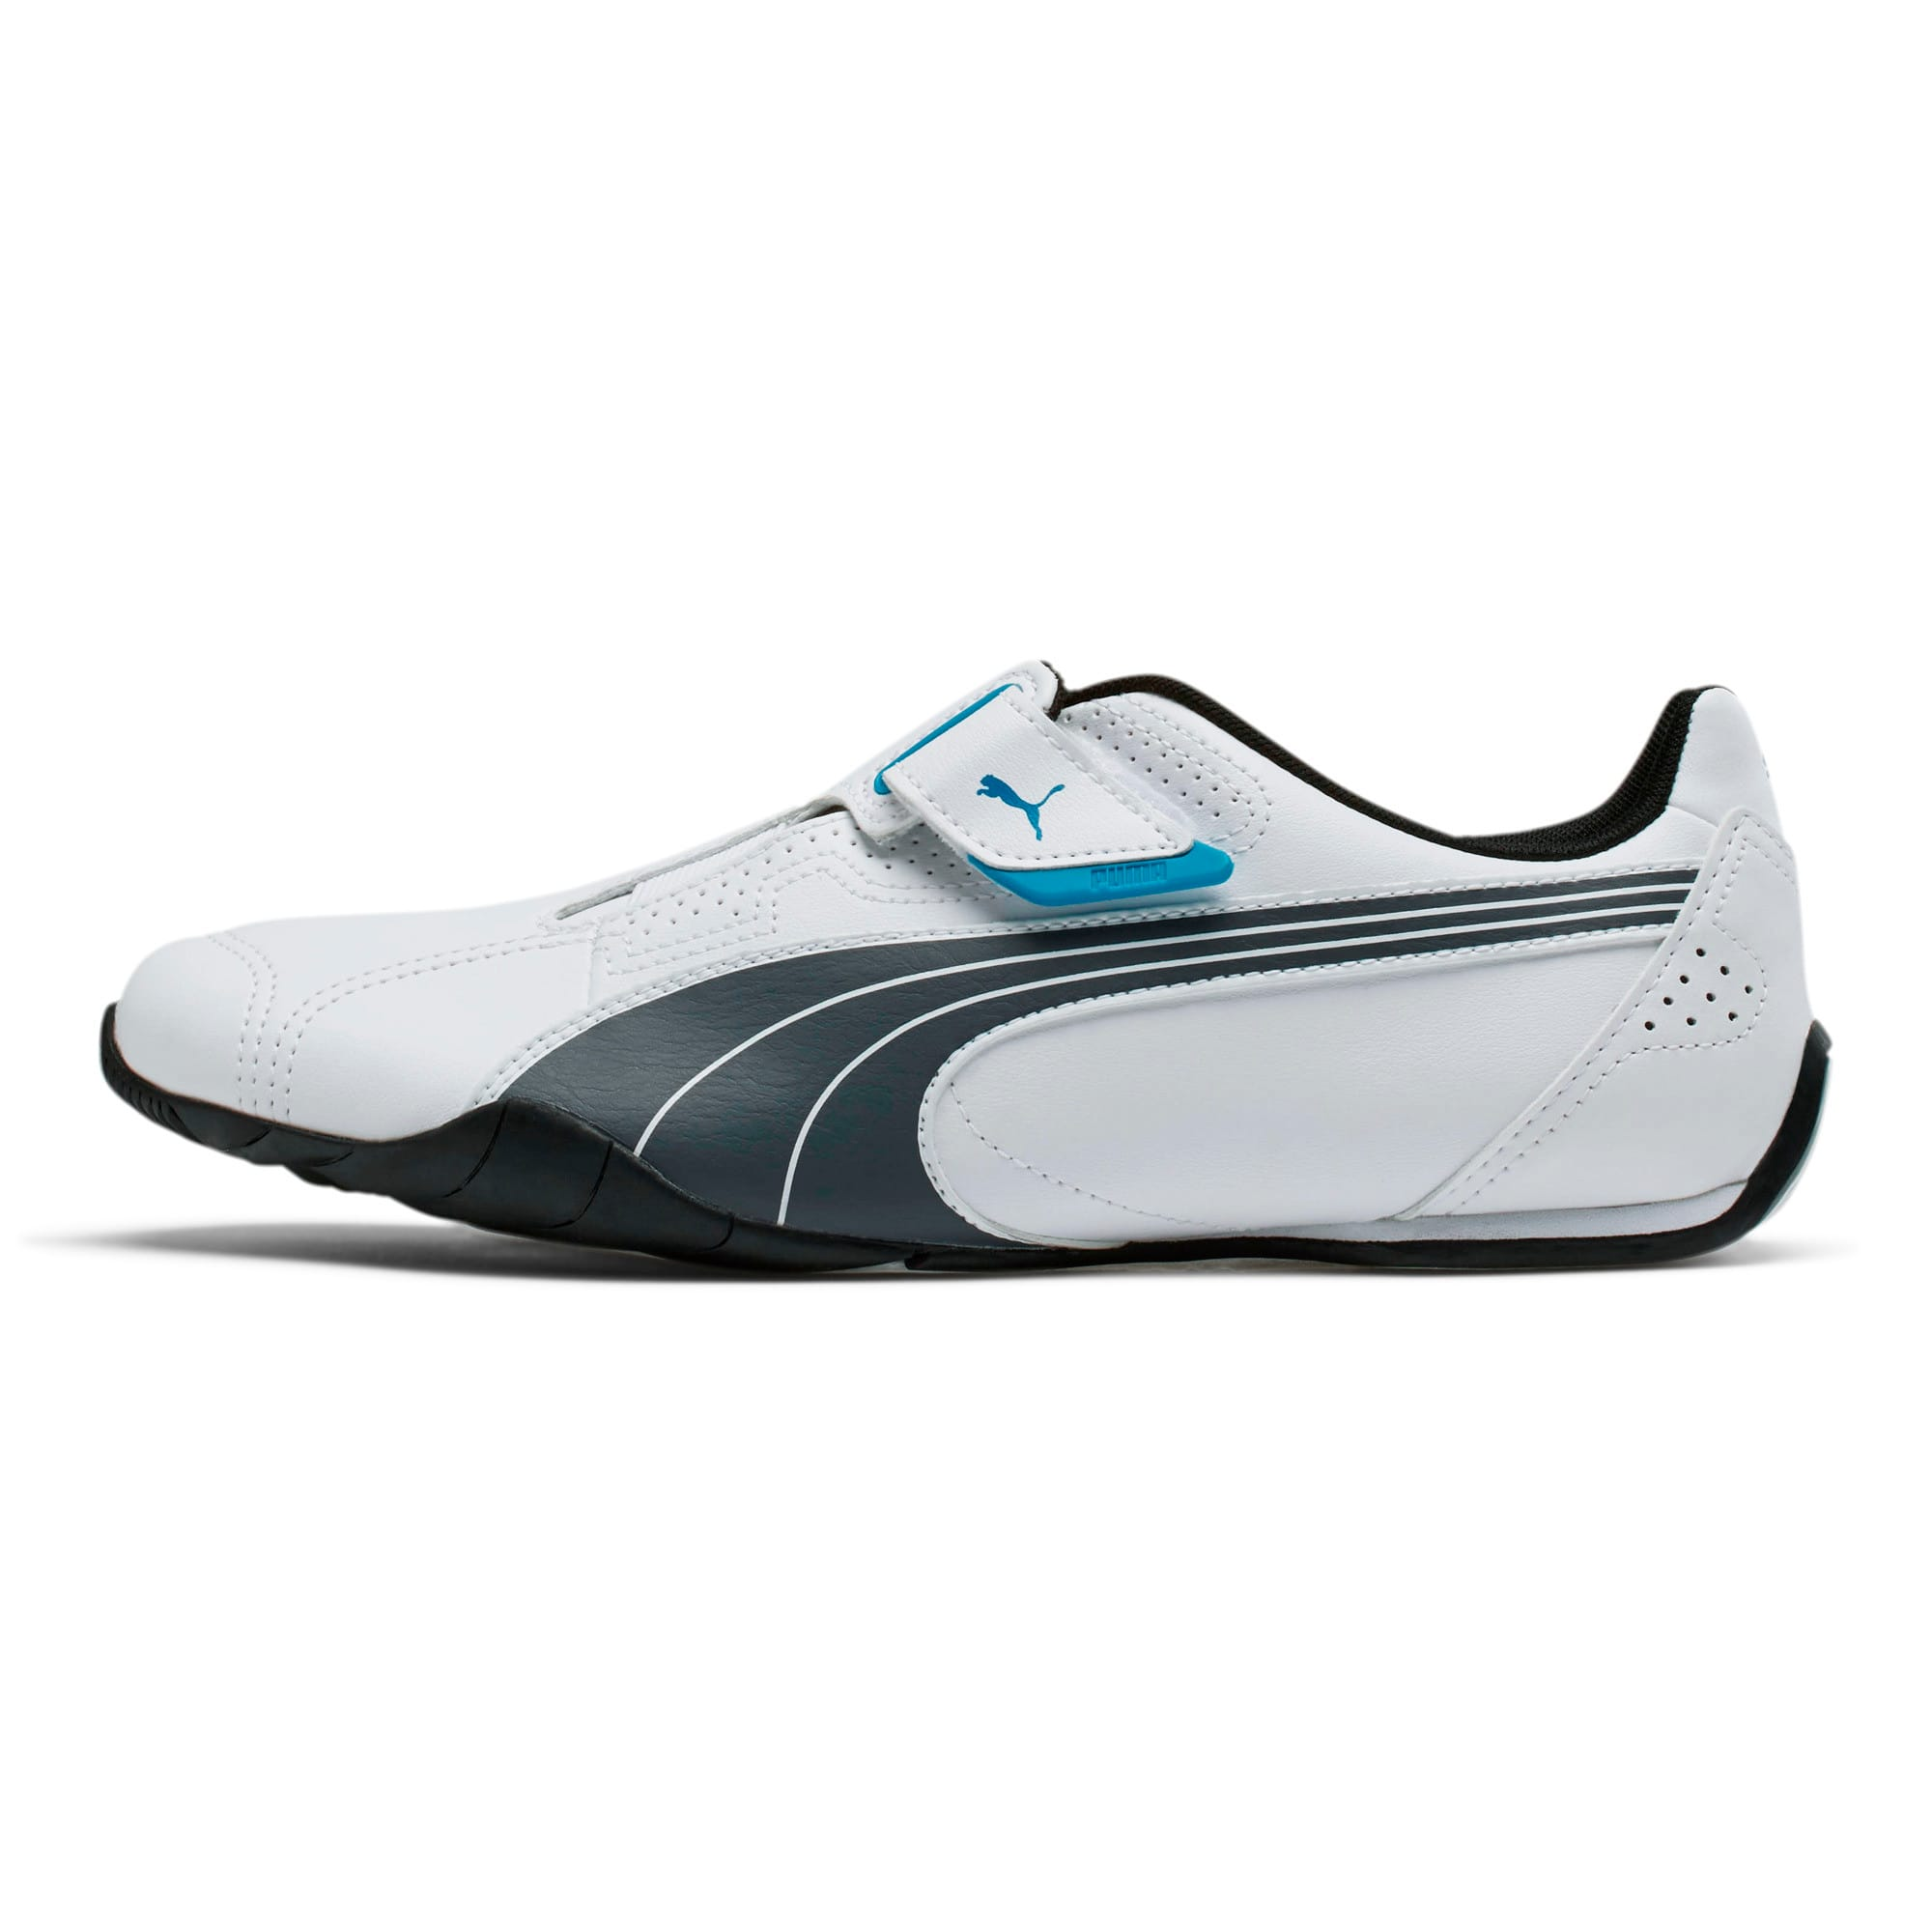 Thumbnail 1 of Redon Move Shoes, white-dark shadow-black, medium